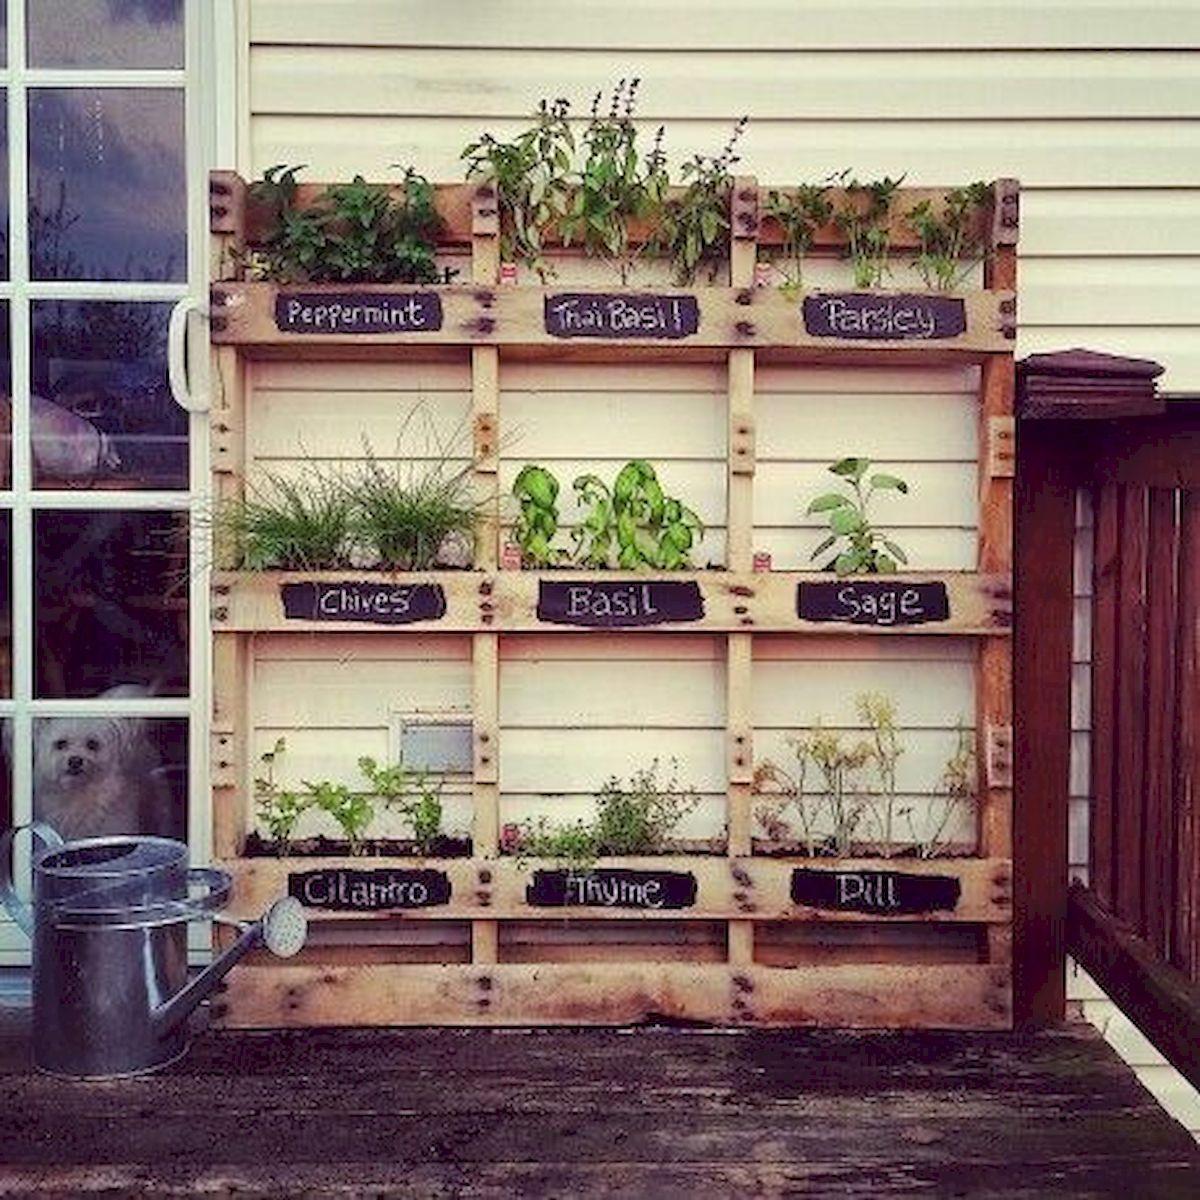 33 Stunning Herb Garden Design Ideas And Remodel33DECOR